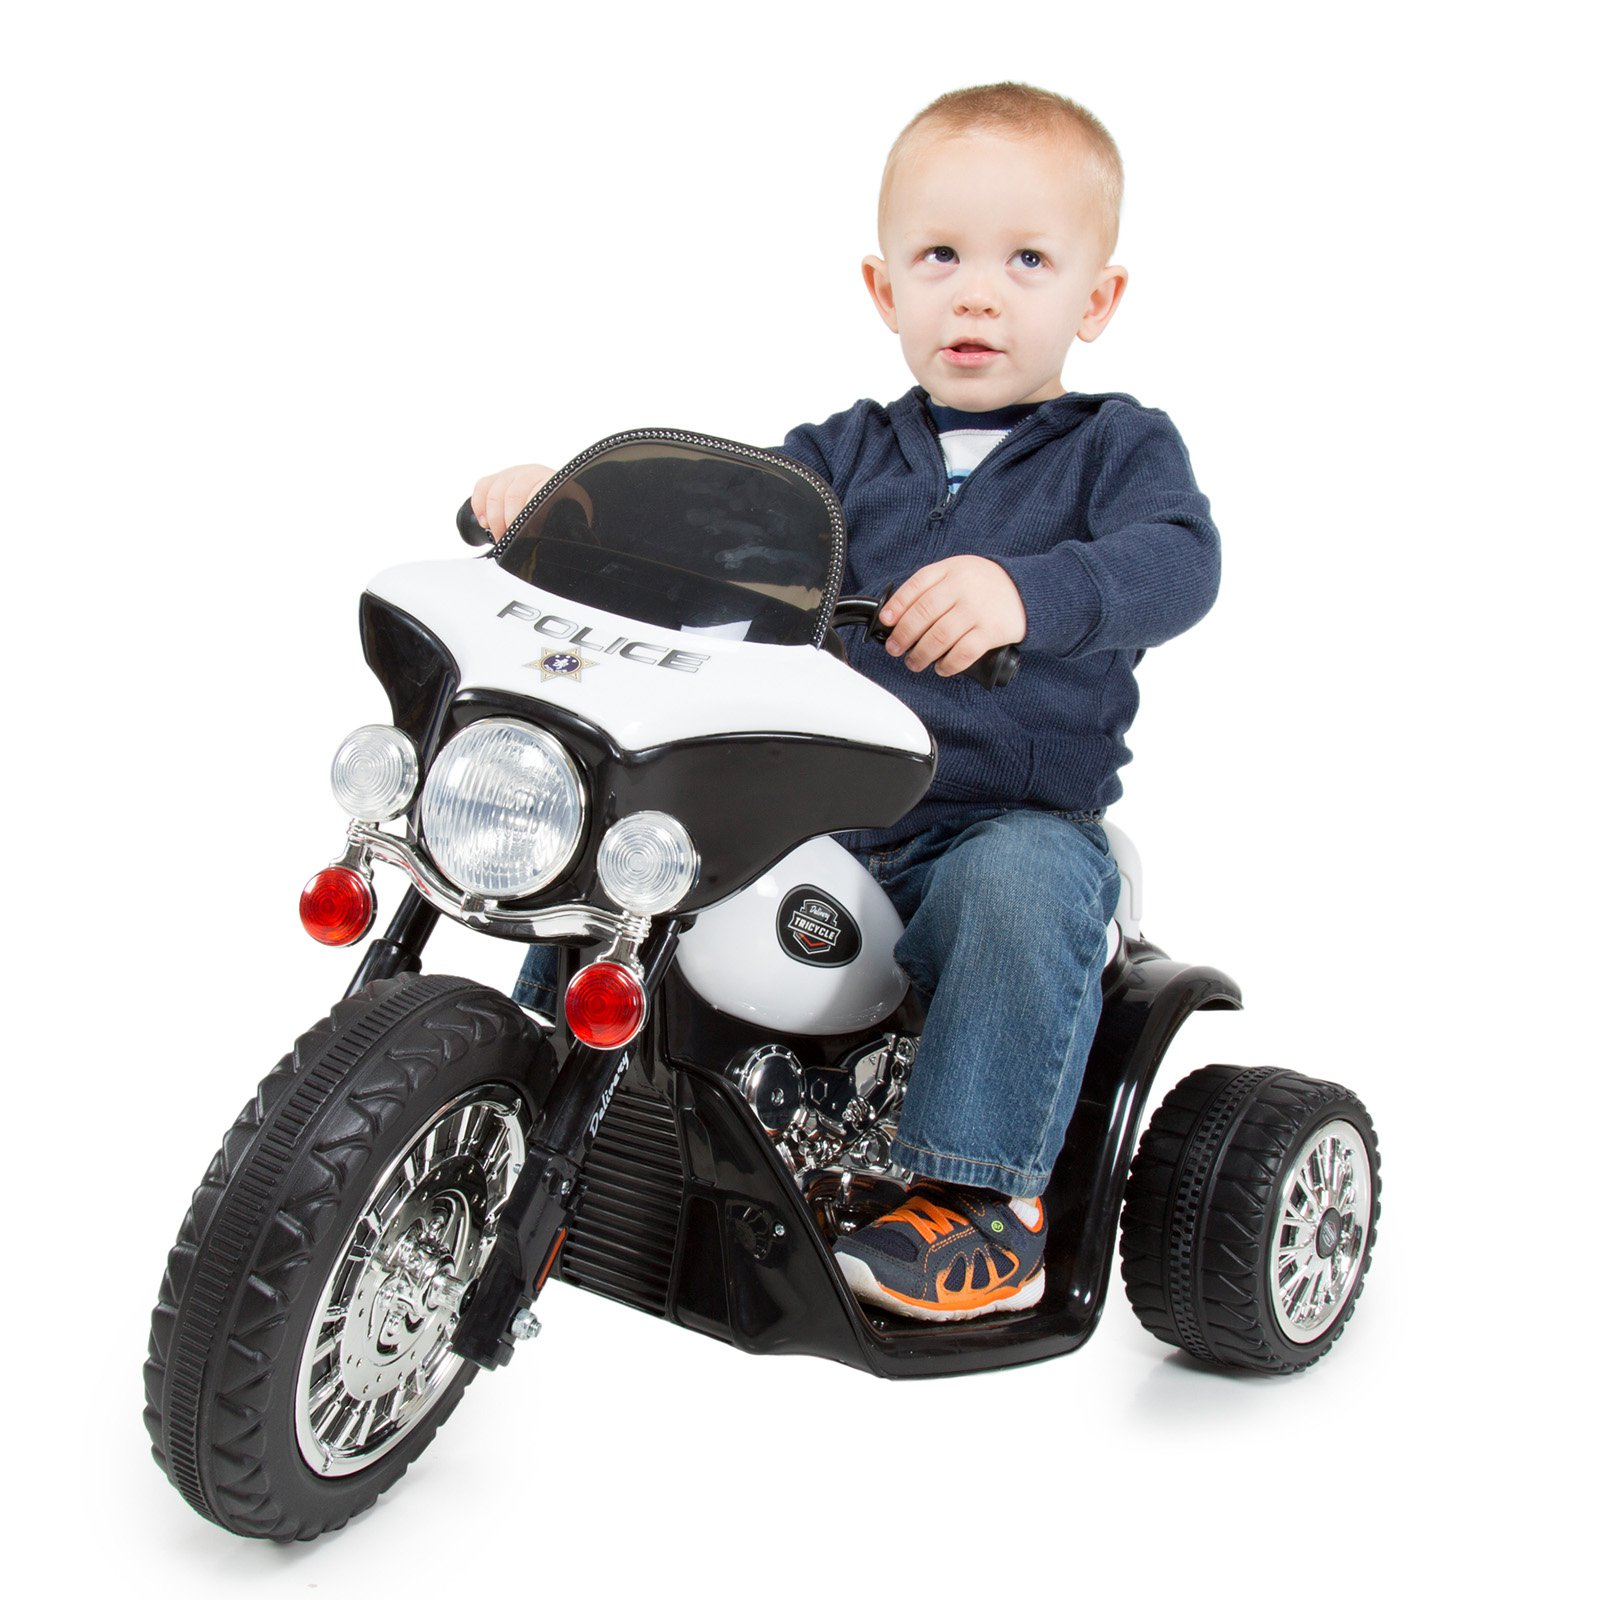 Lil Rider Mini Three Wheel Police Chopper Battery Powered Riding Toy by Trademark Global LLC